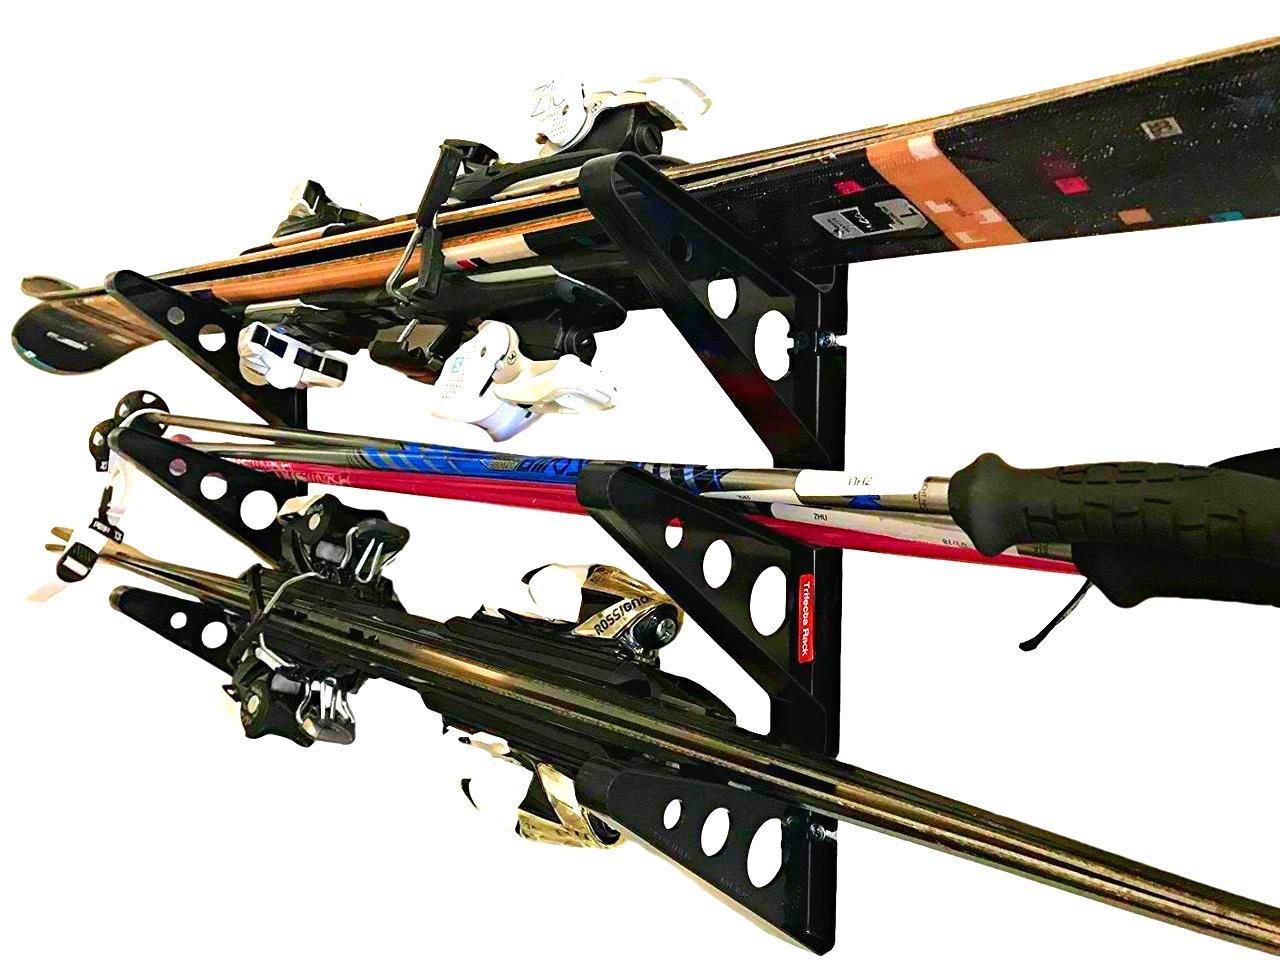 Ski Storage Rack | Horizontal Wall Rack | StoreYourBoard by StoreYourBoard